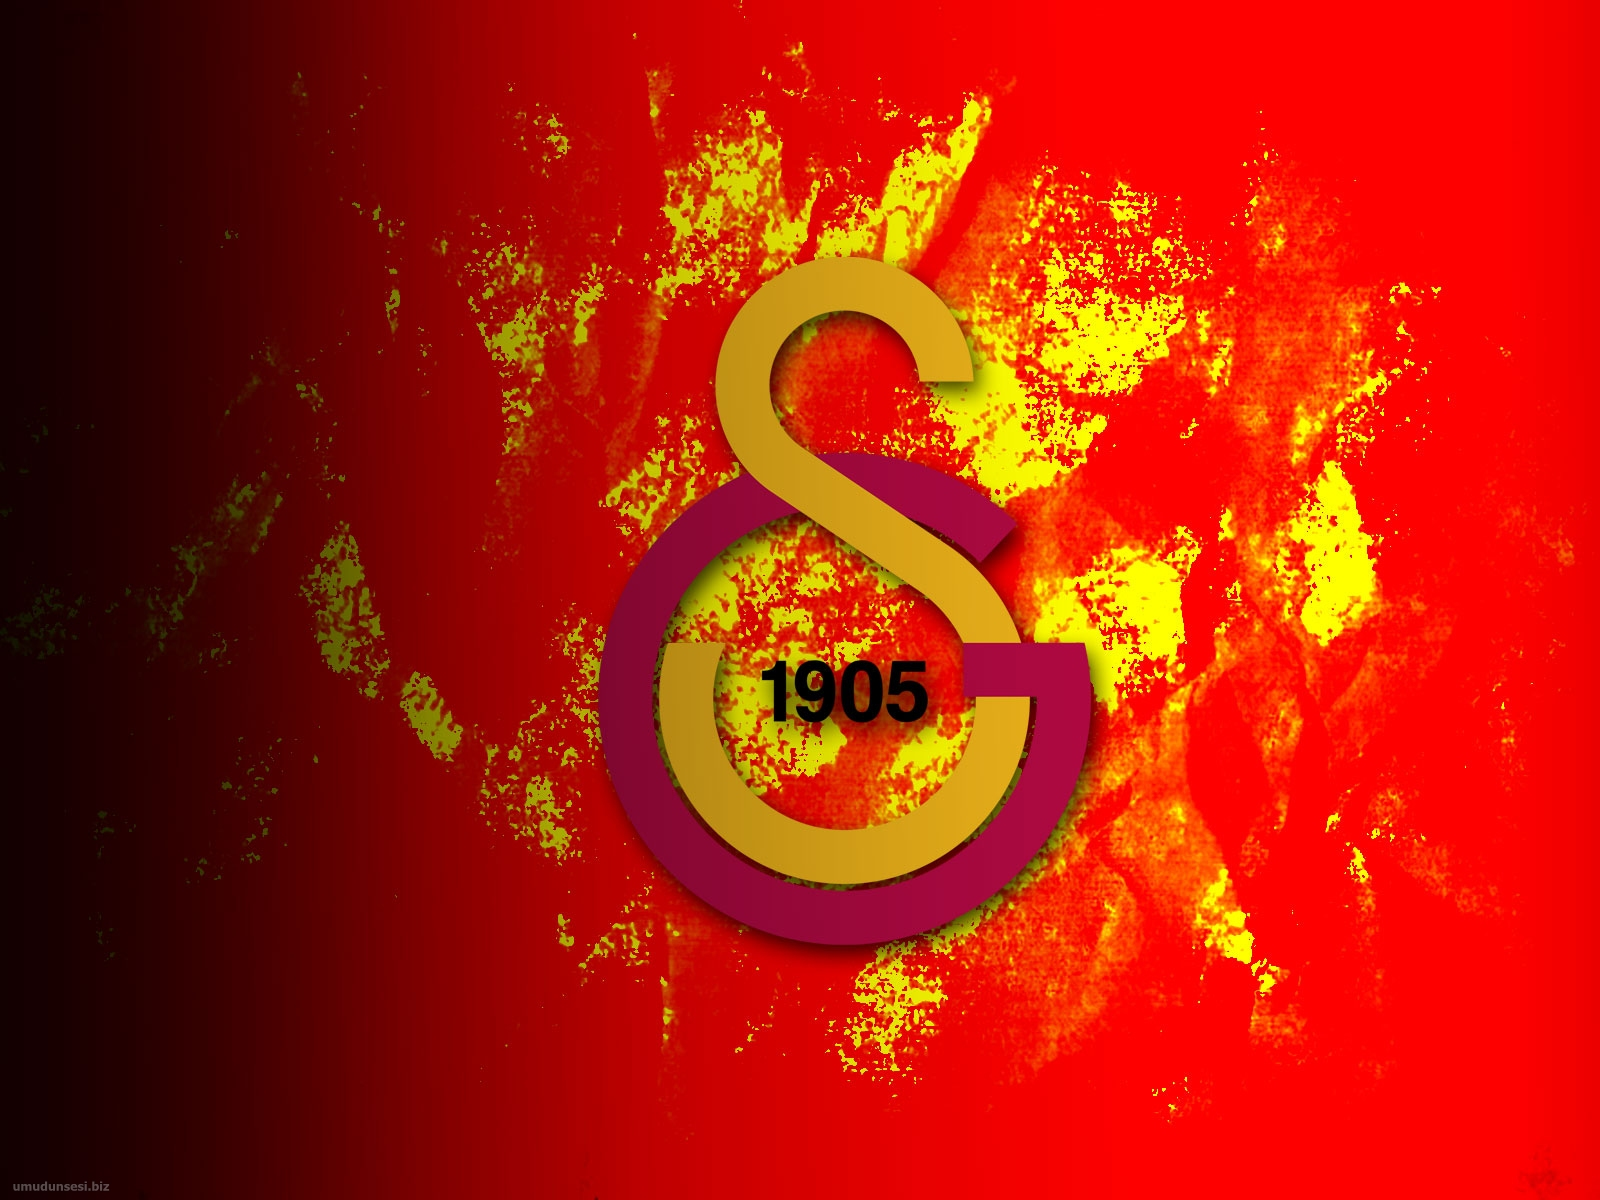 Galatasaray hd wallpaper